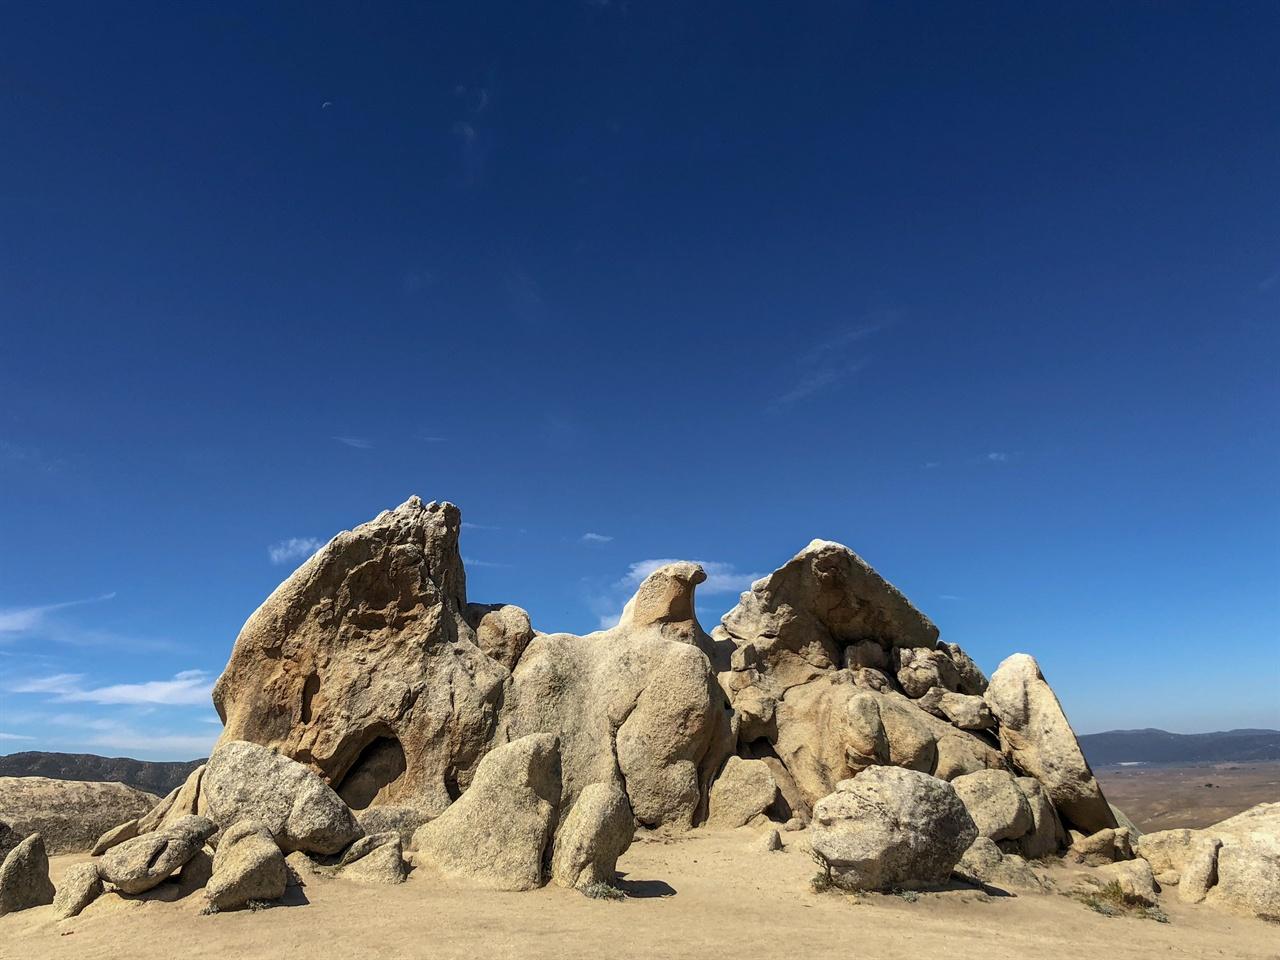 Eagle Rock 워너스 스프링스(Wanners Spings) 직전에 독수리 형상으로 유명한 바위